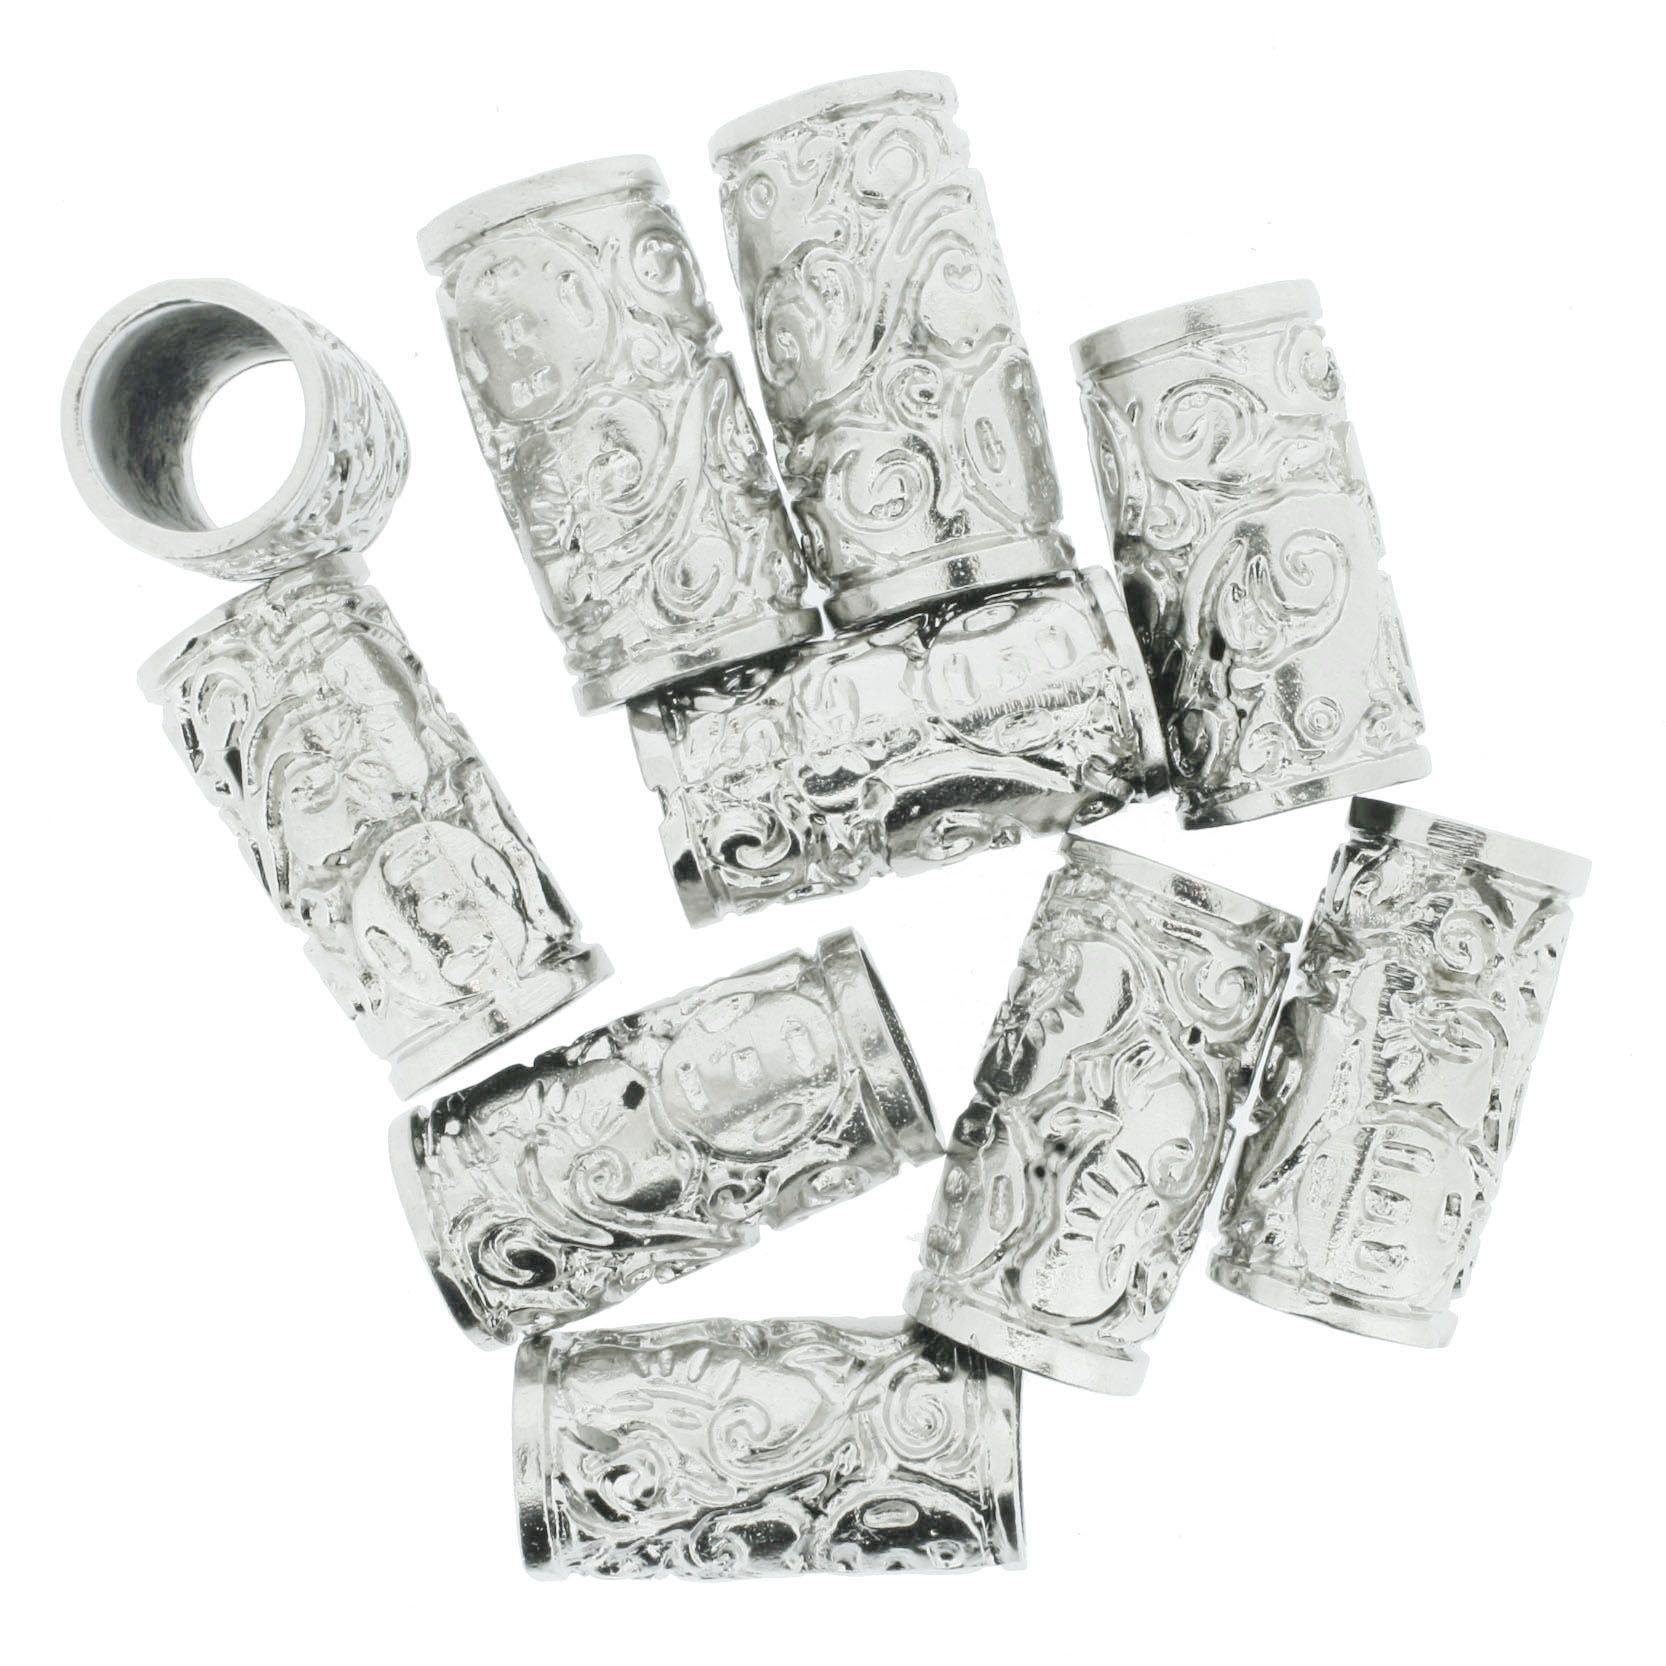 Firma de Metal - Níquel - 26mm  - Stéphanie Bijoux® - Peças para Bijuterias e Artesanato